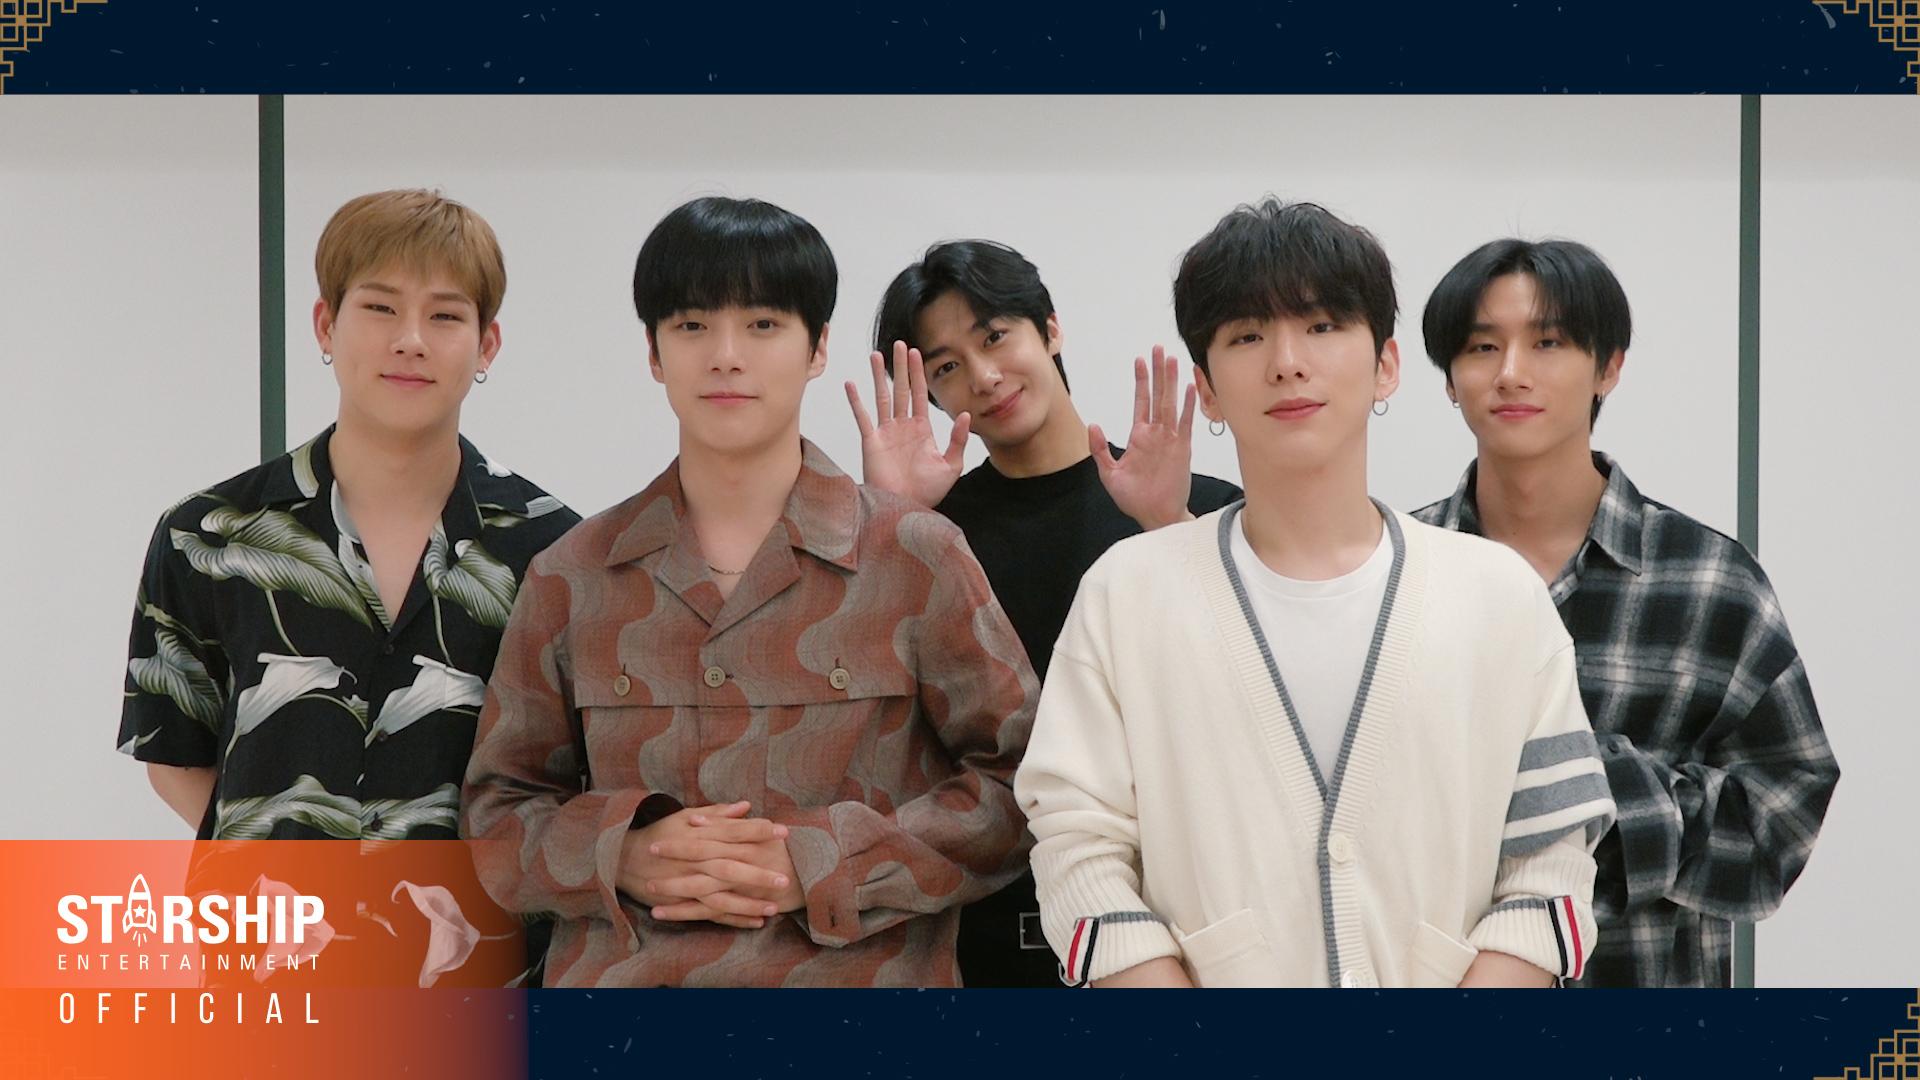 [Special Clip] 몬스타엑스 (MONSTA X) - 2021 추석 인사 (Chuseok Greeting)